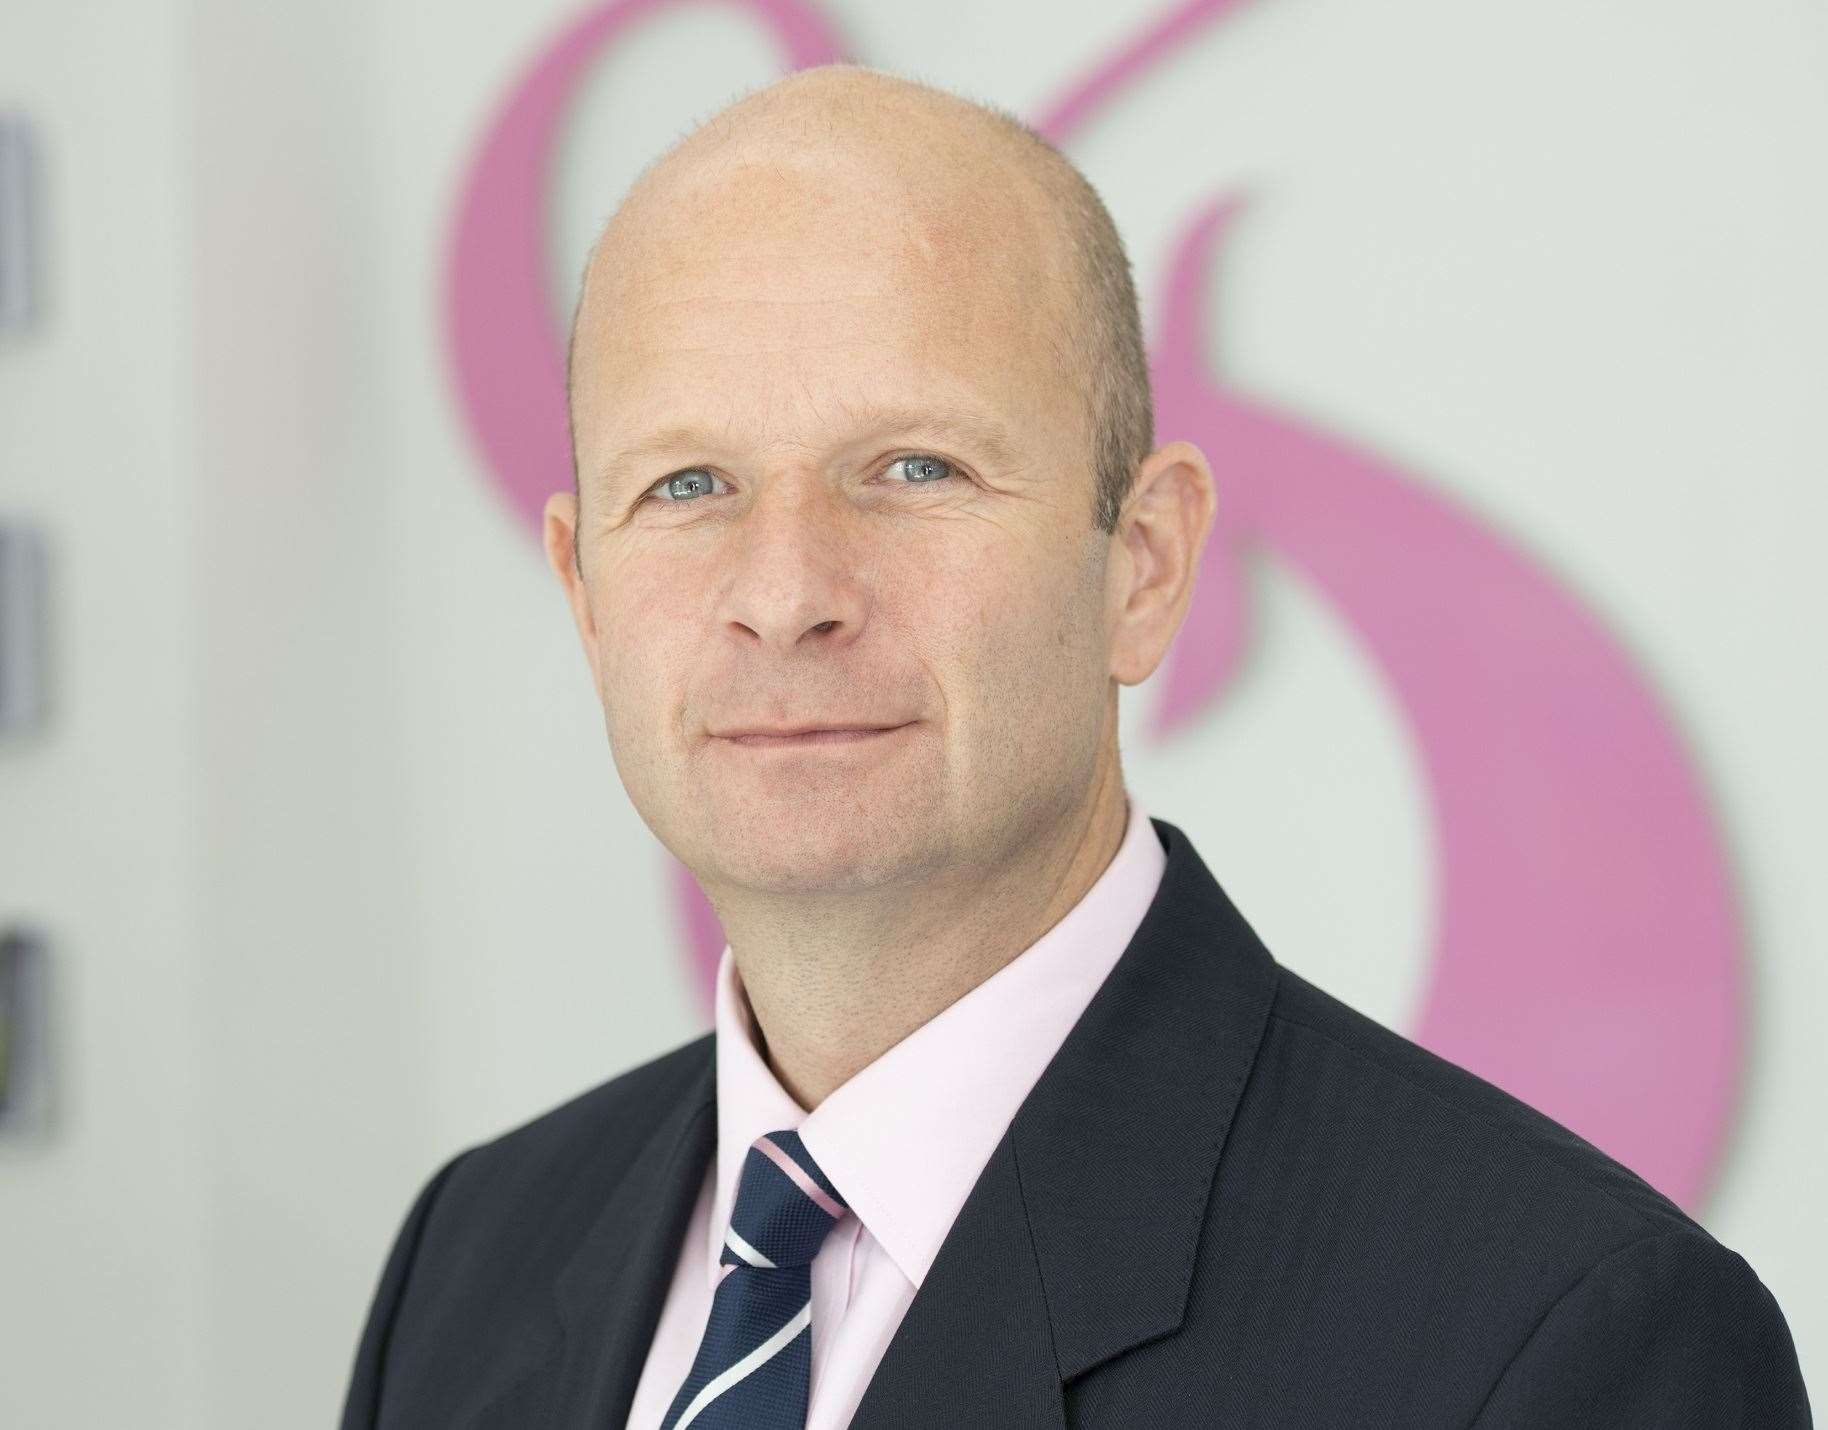 Charlie Bainbridge, director of Charles Bainbridge estate agents